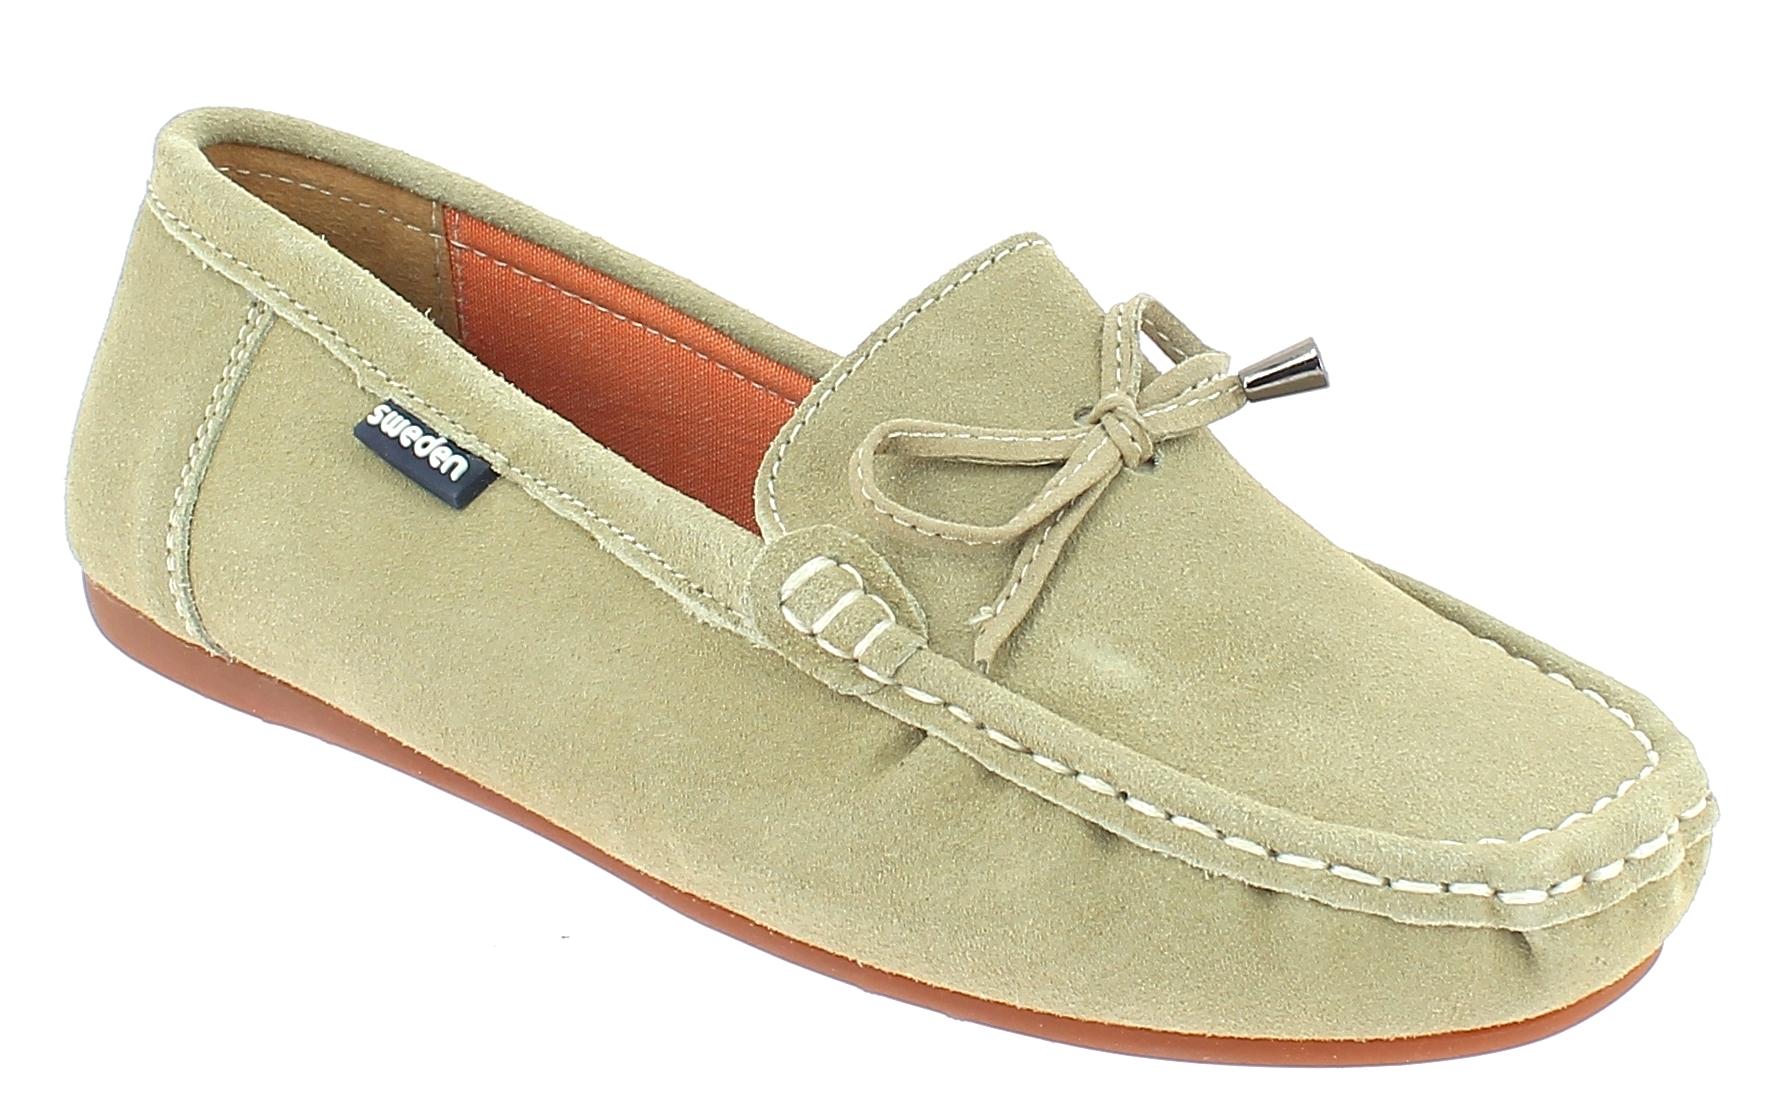 SWEDEN KLE Γυναικείο Casual 564050 Μπεζ - IqShoes - 564050 CAMEL-SWEDEN KLE-beig παπούτσια  new in